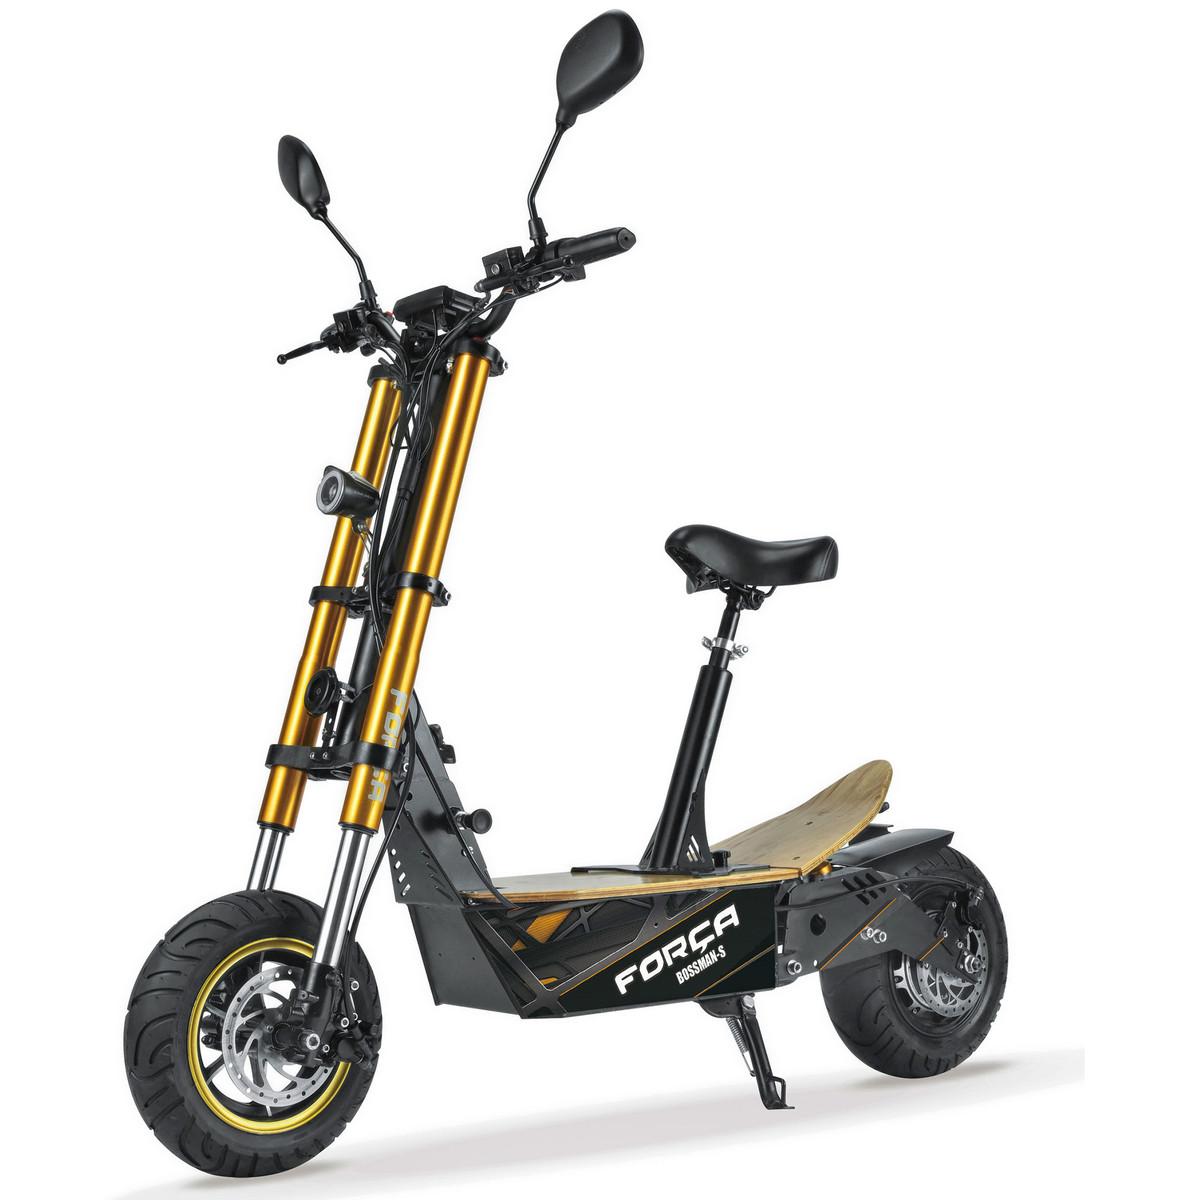 FORÇA Bossman-S II Elektro-Scooter mit 15Ah Bleigel-Akku 48 V 1500 W Straßenzulassung EEC 45km/h Topspeed in Schwarz-Gold